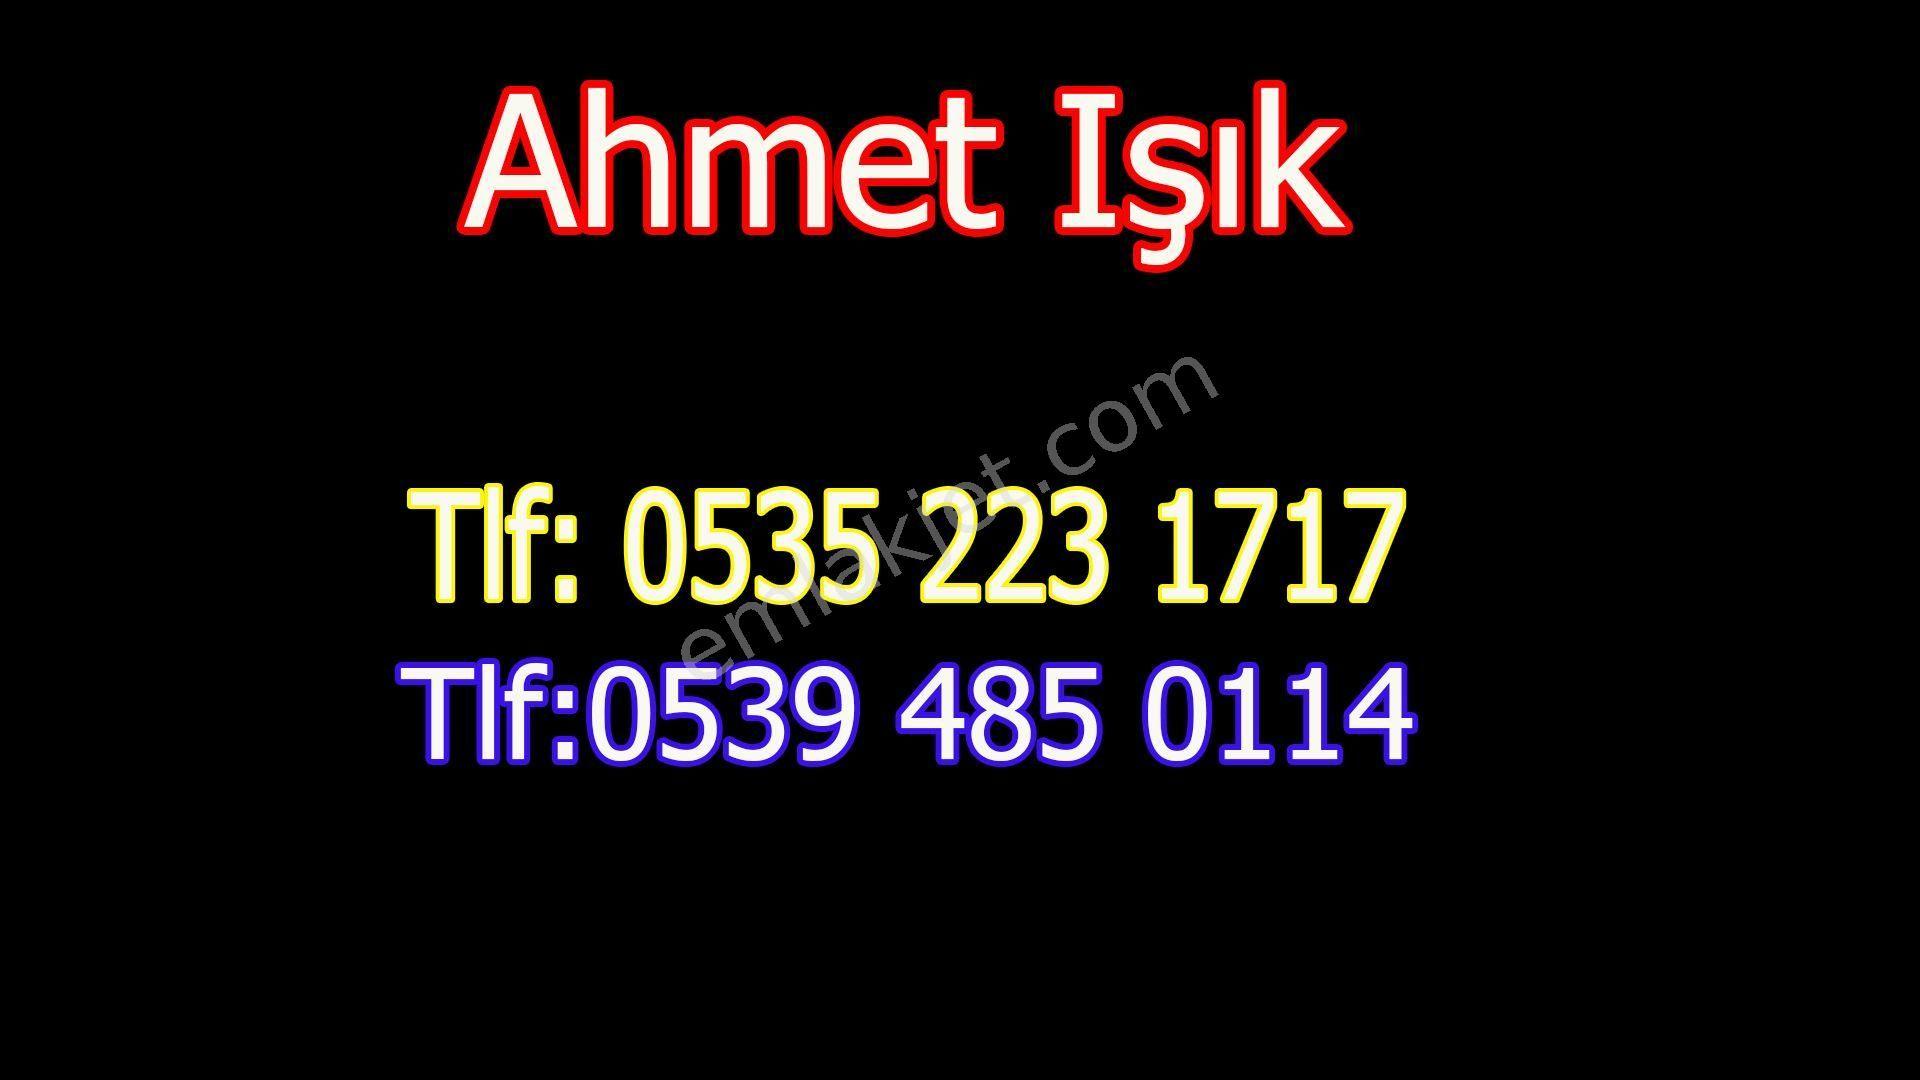 https://imaj.emlakjet.com/listing/9093283/39C66DA3075B2C844BF307E8A22CF10B9093283.jpg